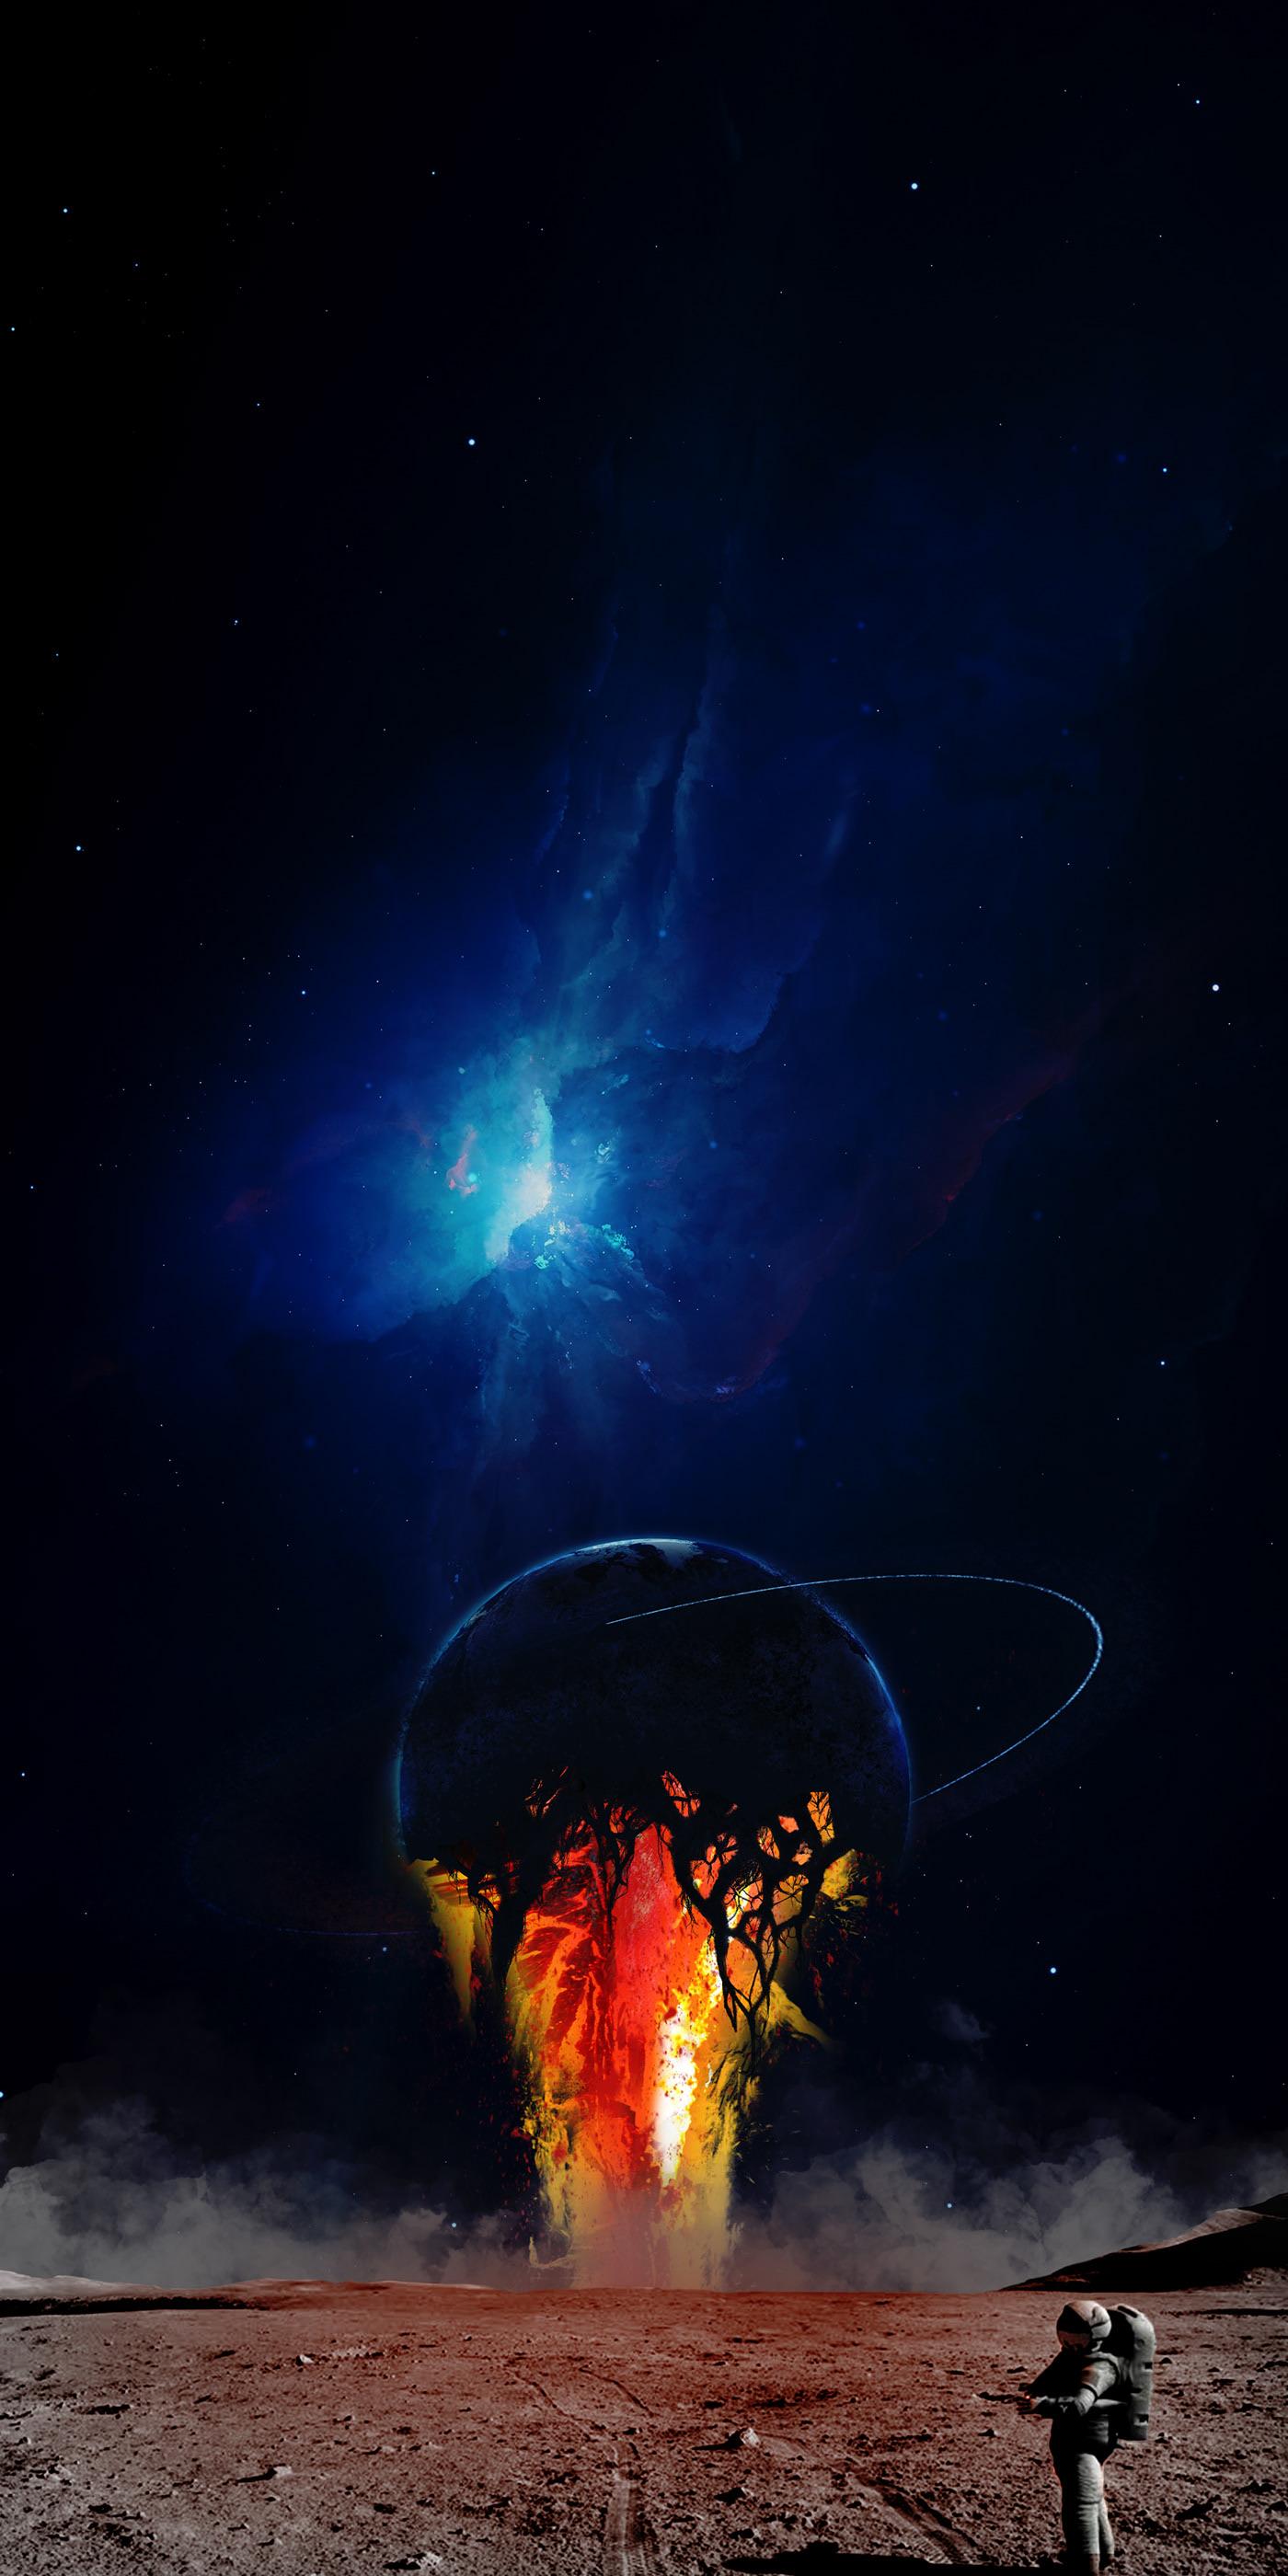 Wallpaper Astronaut Colorful Galaxy Stars Earth Plasma 1400x2800 Spook 1700725 Hd Wallpapers Wallhere